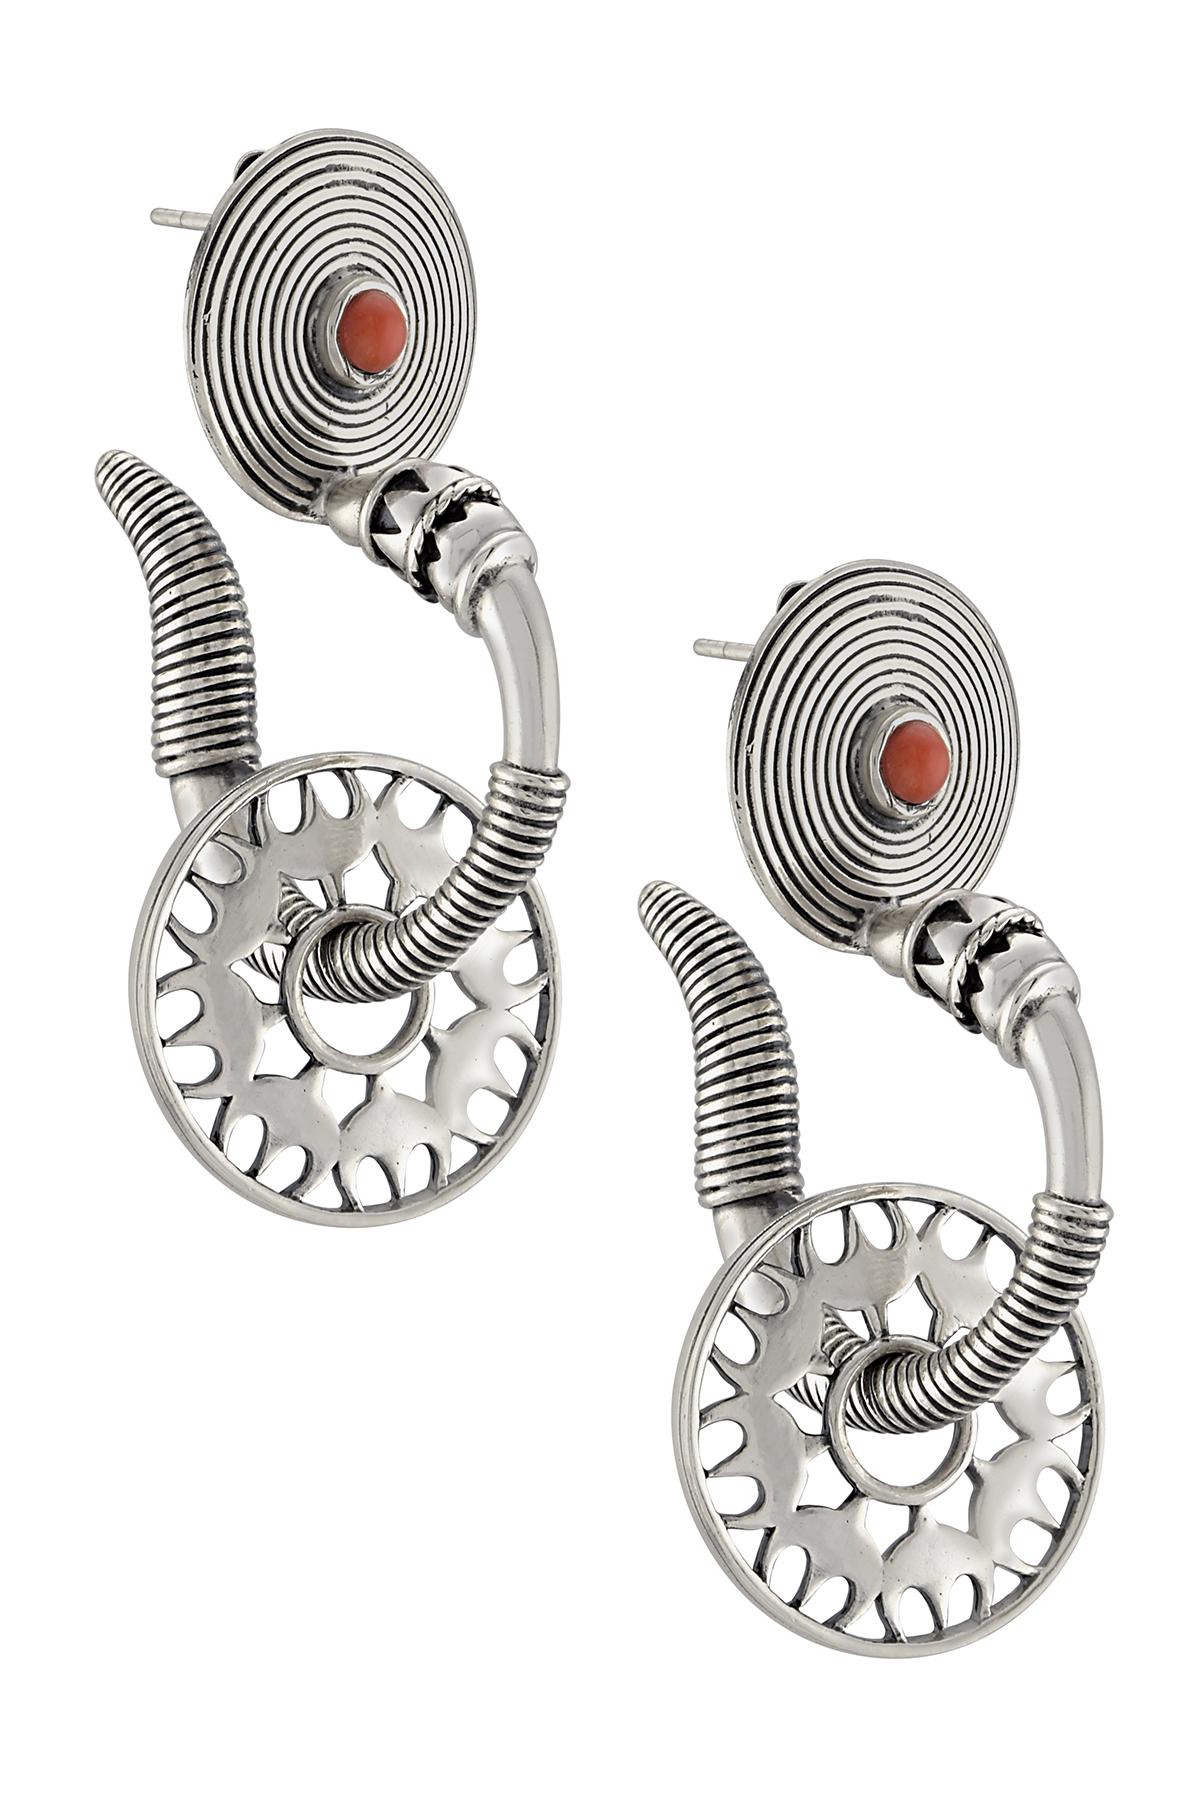 Silver Floral Wheel Charm Earrings